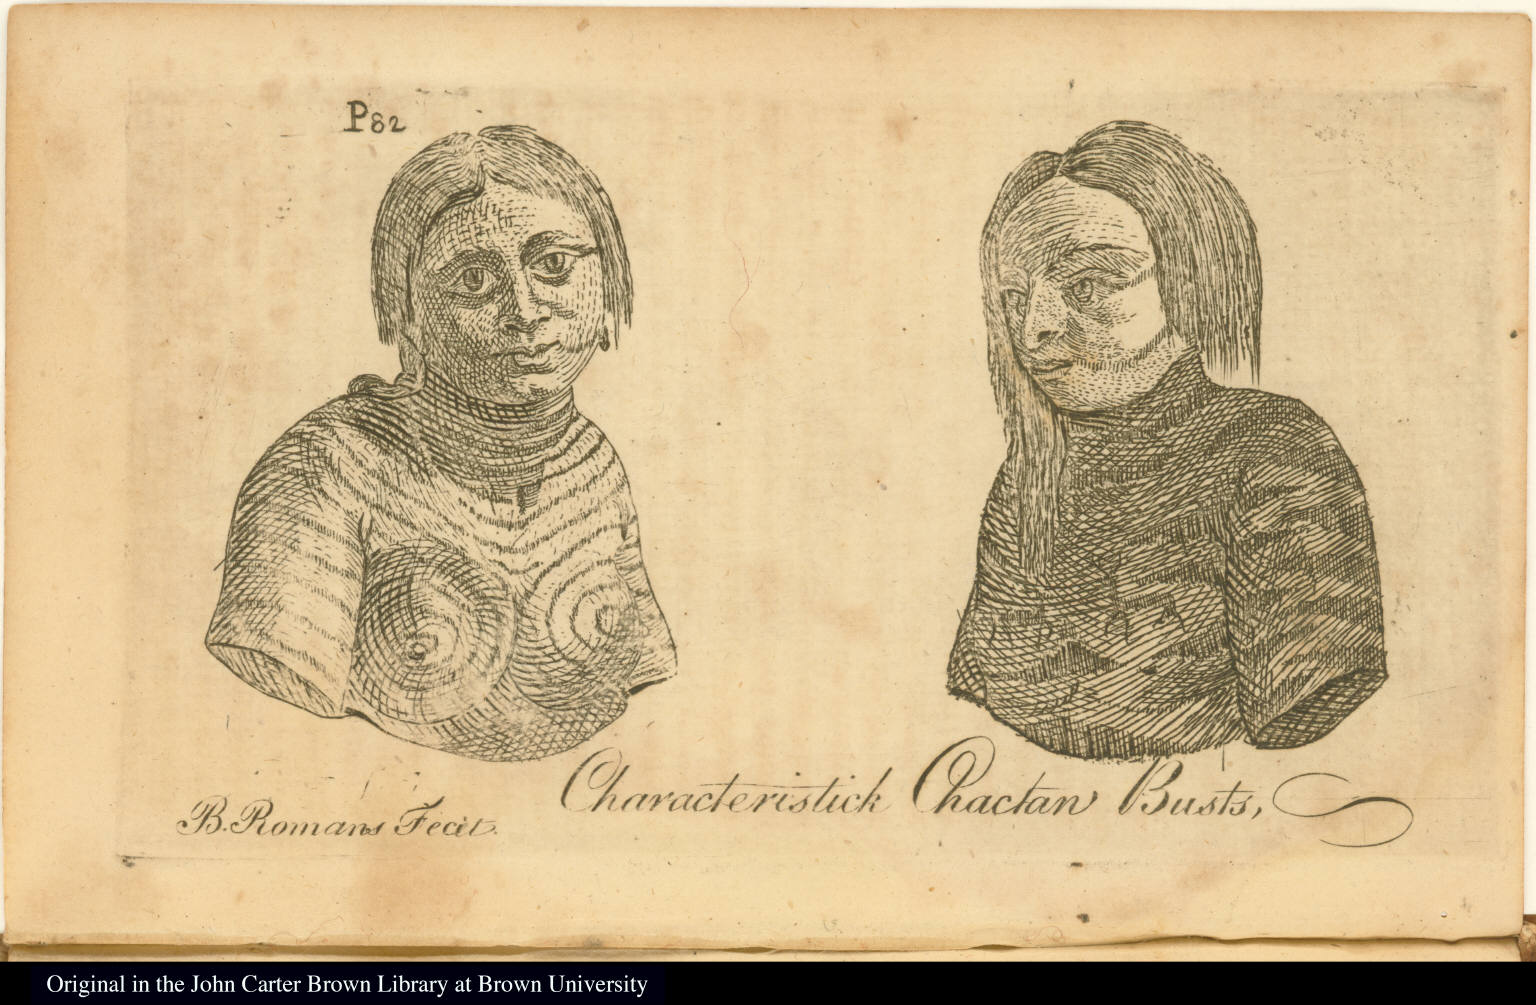 Characteristick Chactaw Busts